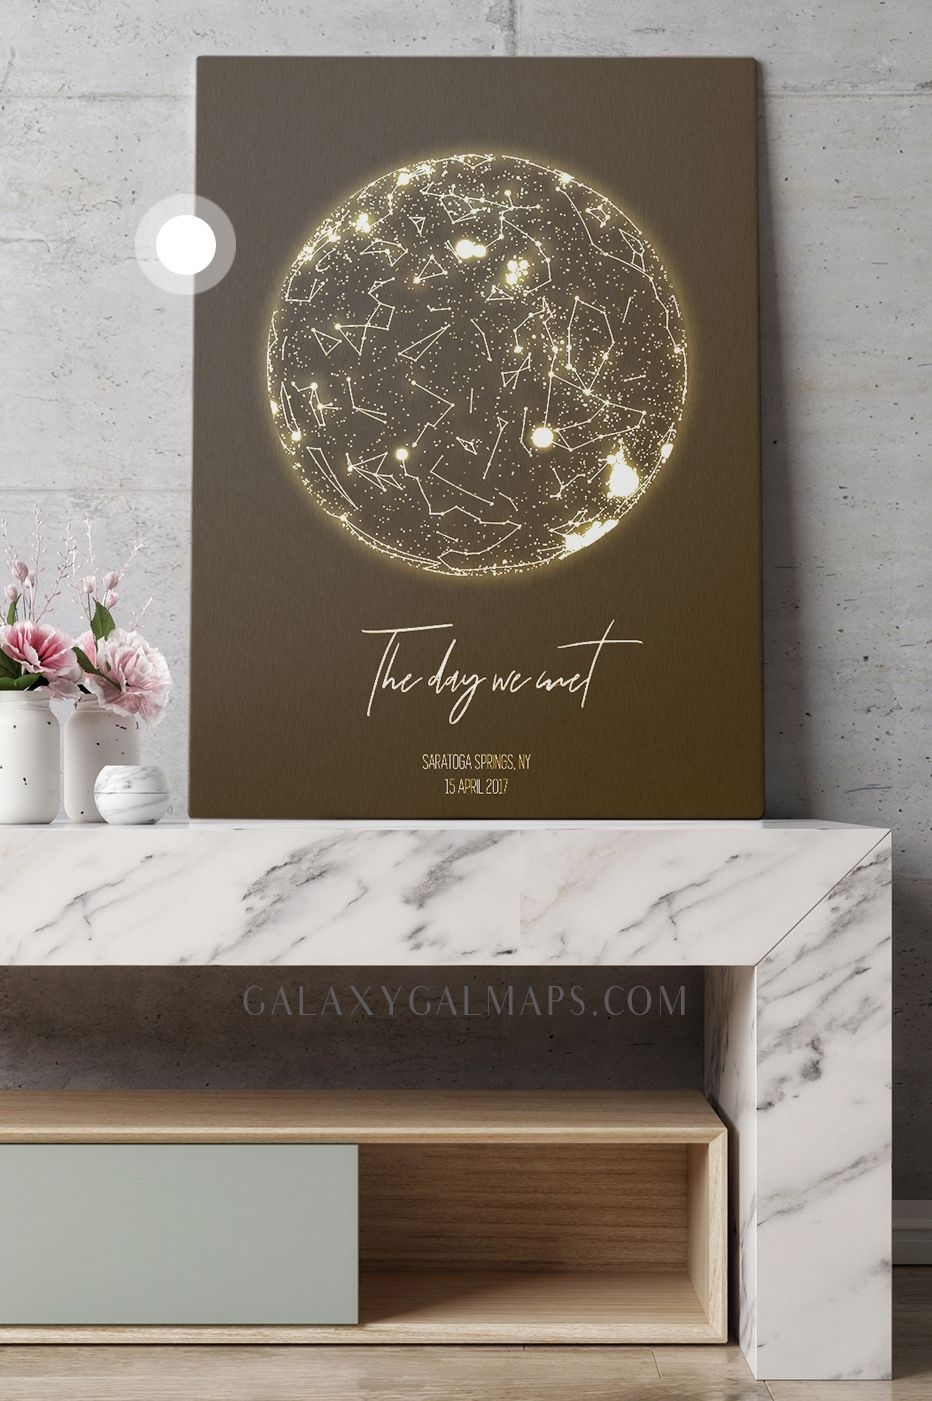 Personalized Star Map - The Night Sky Wall Art - Custom Framed Map inside Custom Wall Art (Image 17 of 20)